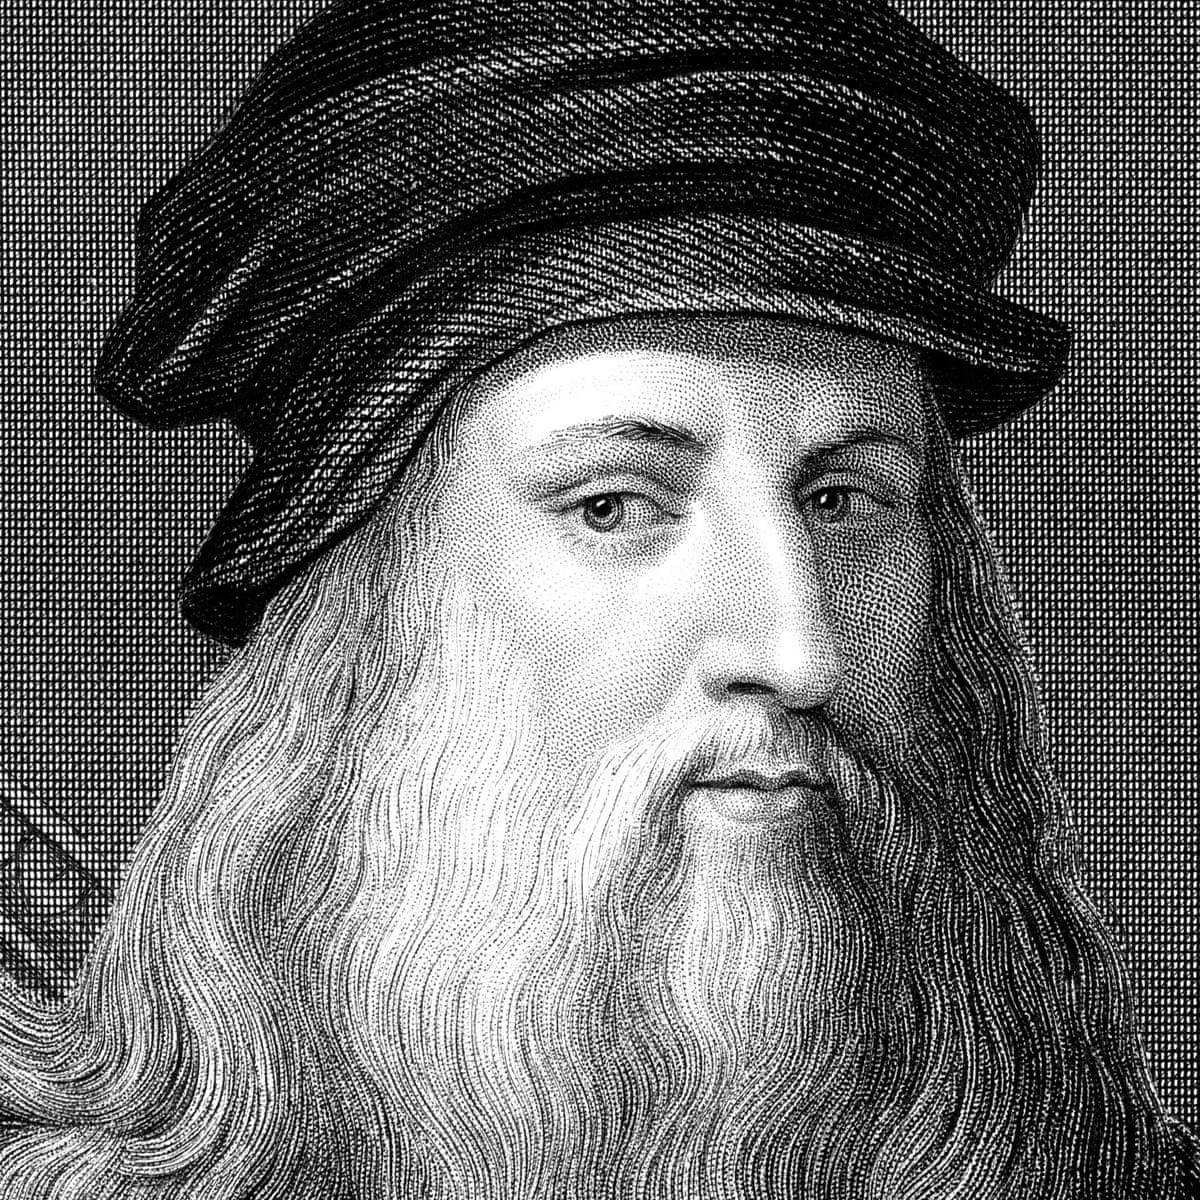 Leonardo Da Vinci The Biography By Walter Isaacson Review Unparalleled Creative Genius Books The Guardian